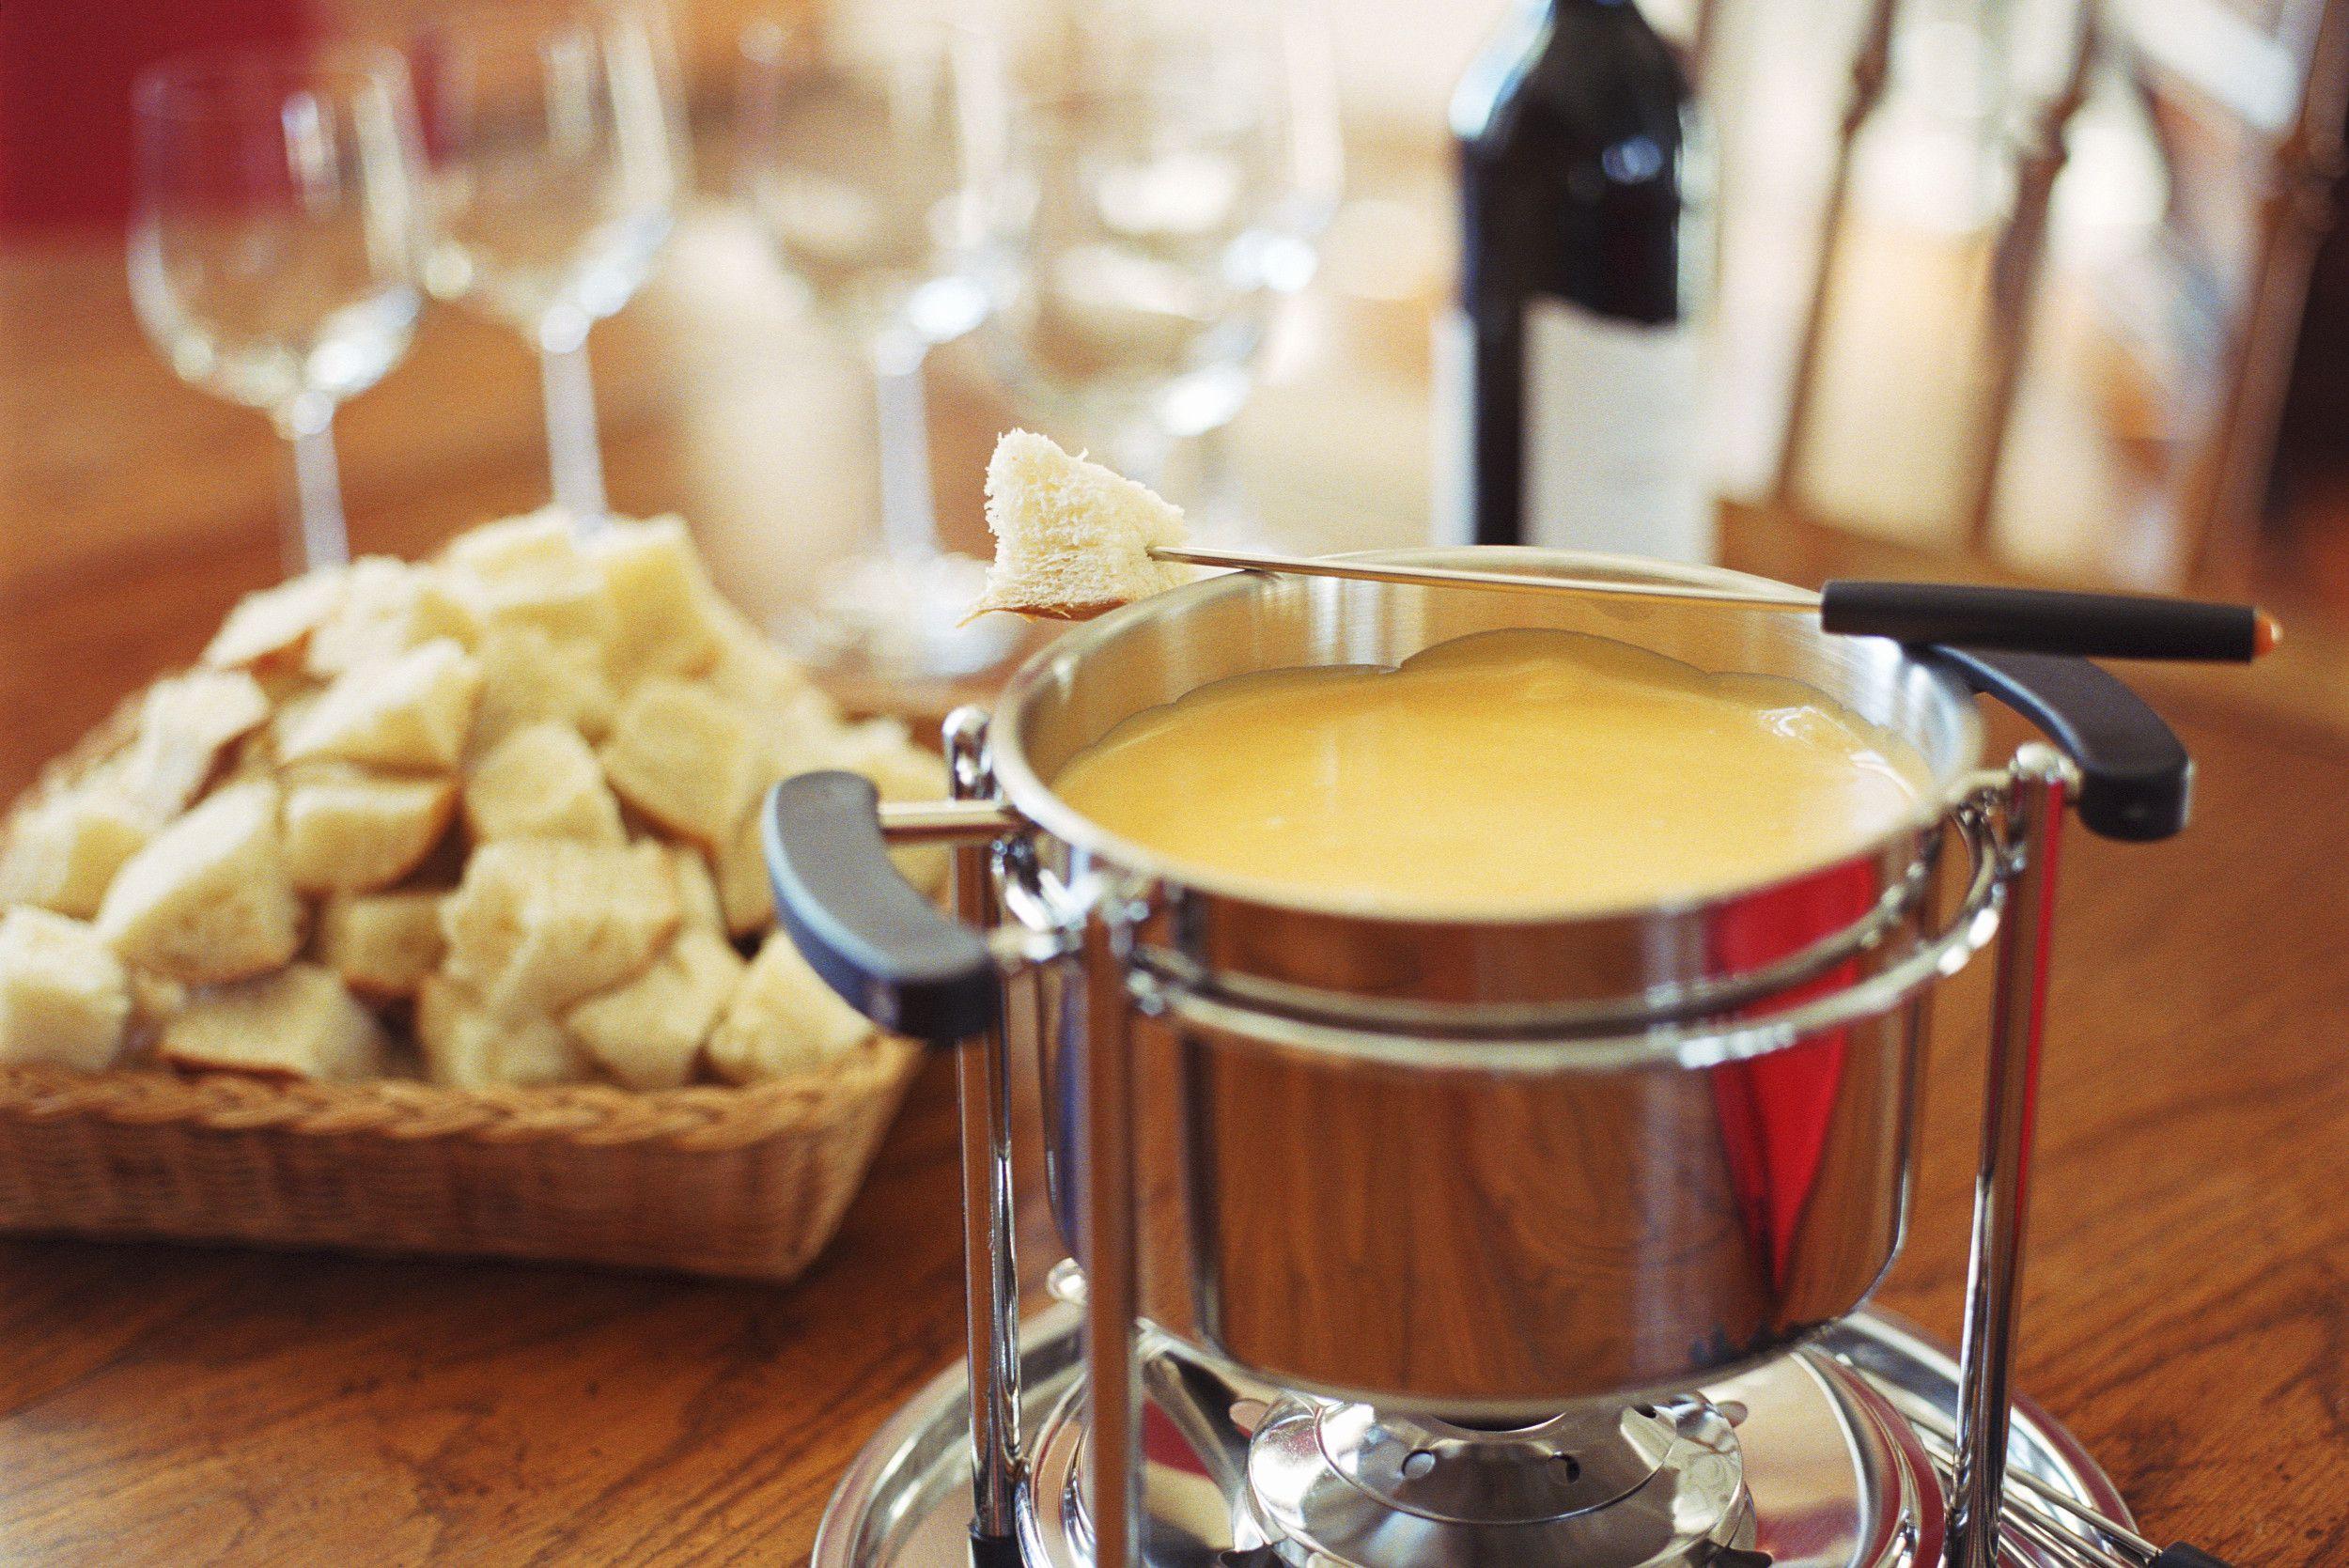 Cheese Fondue Recipe With Brandy or Cognac